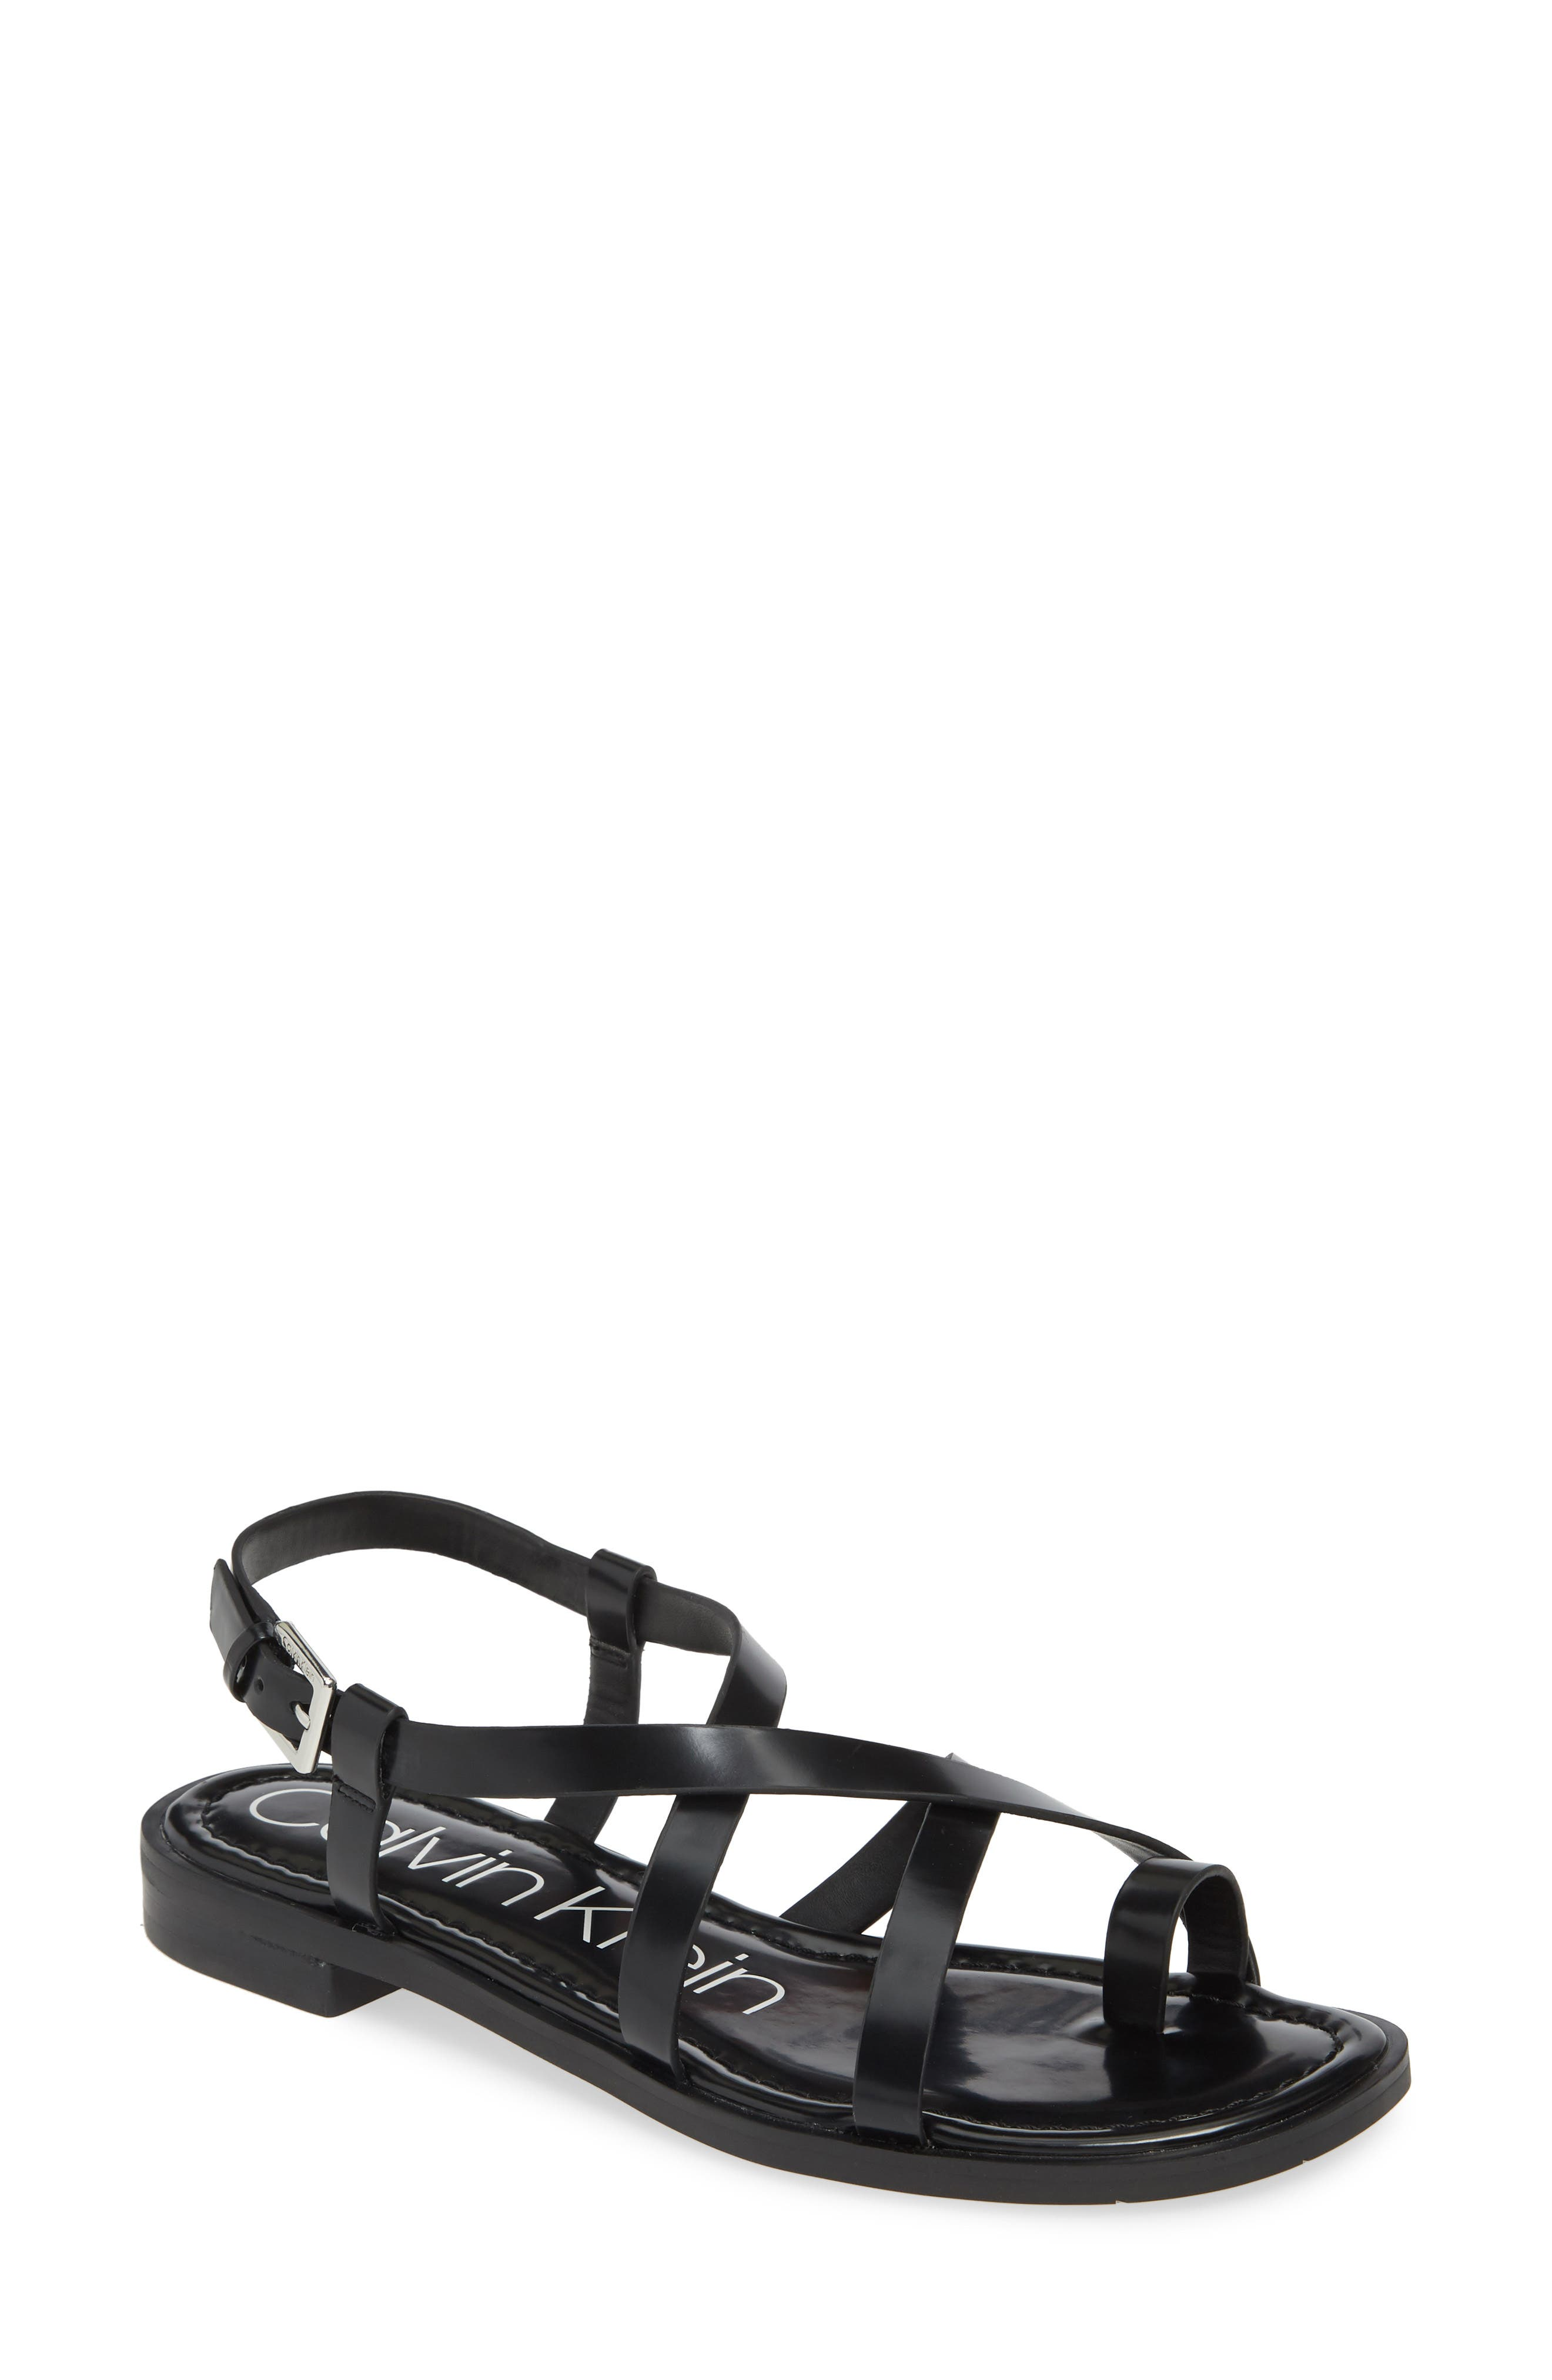 Calvin Klein Tica Sandal- Black